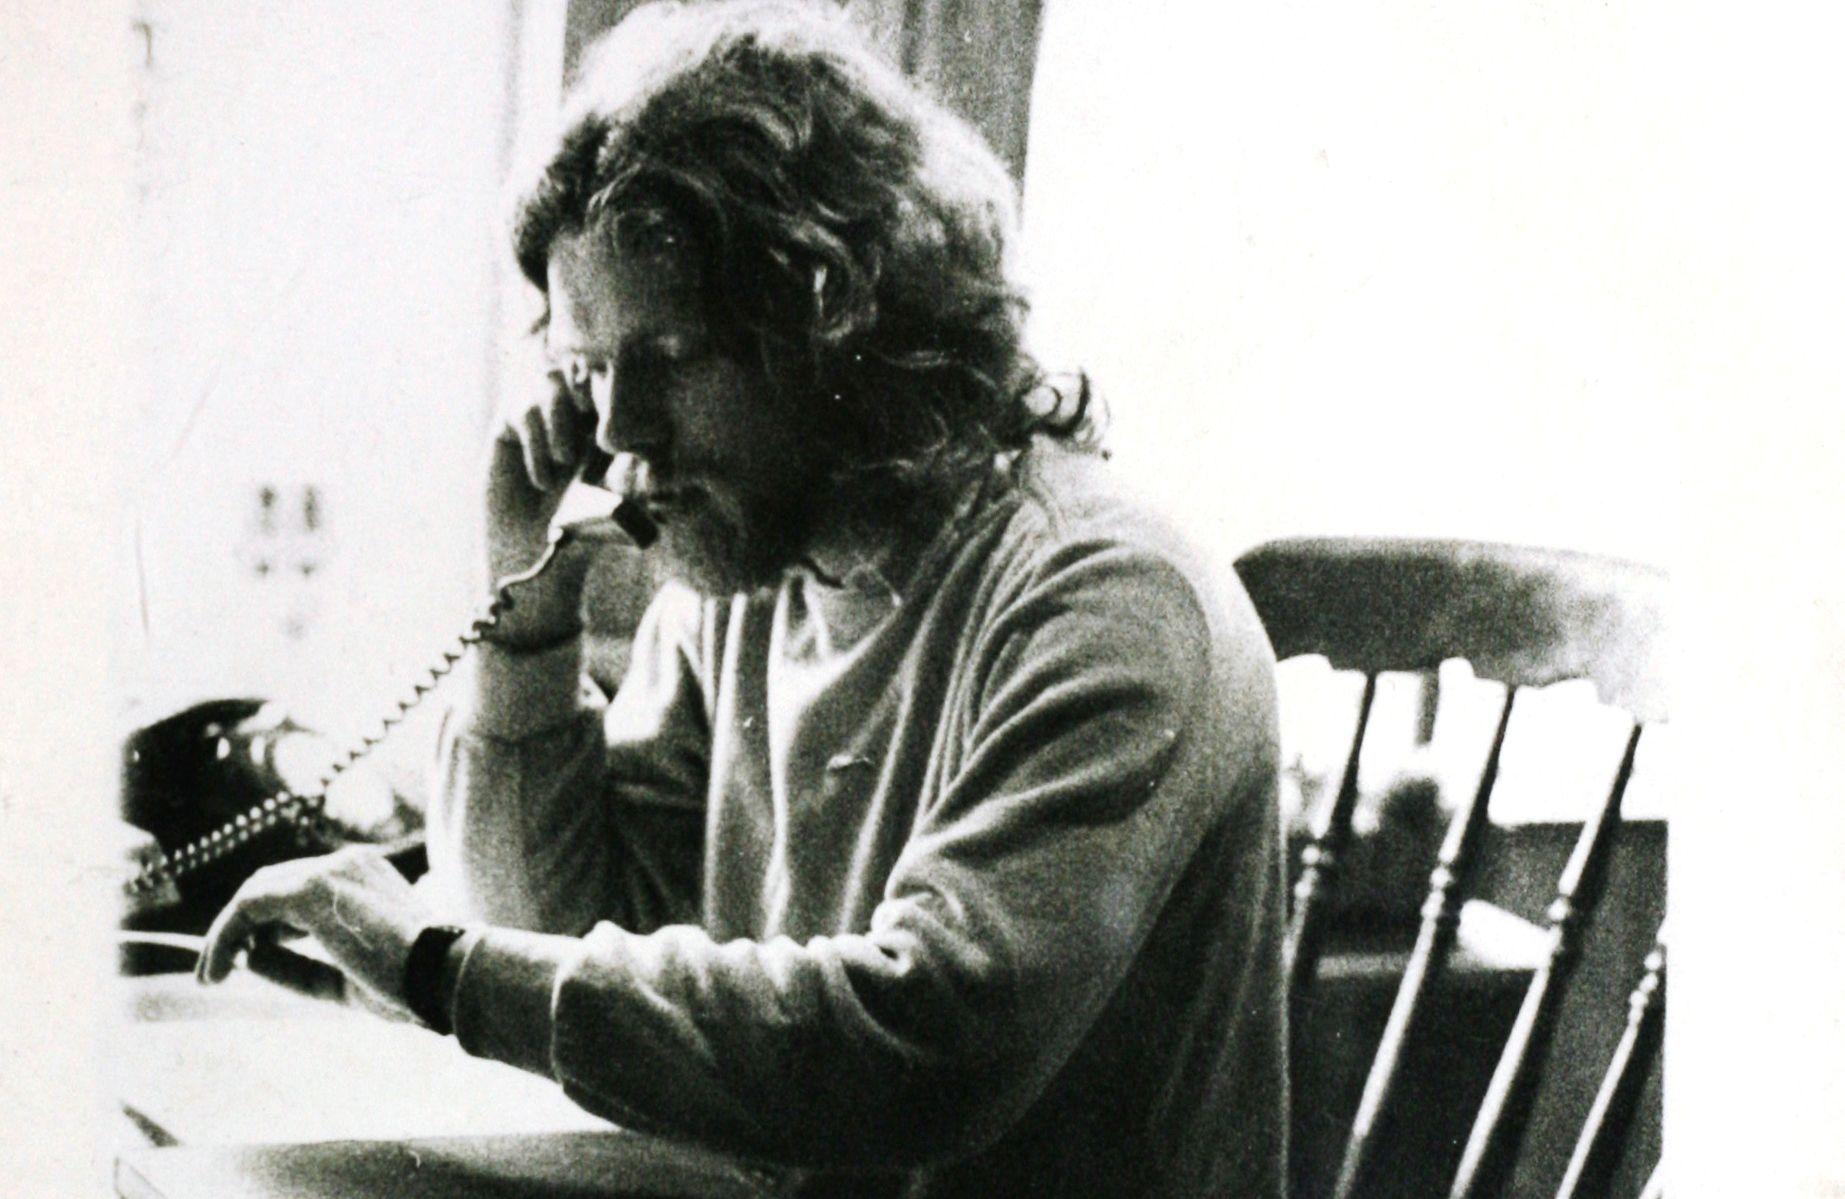 Richard Branson working early days 25 years old, Richard